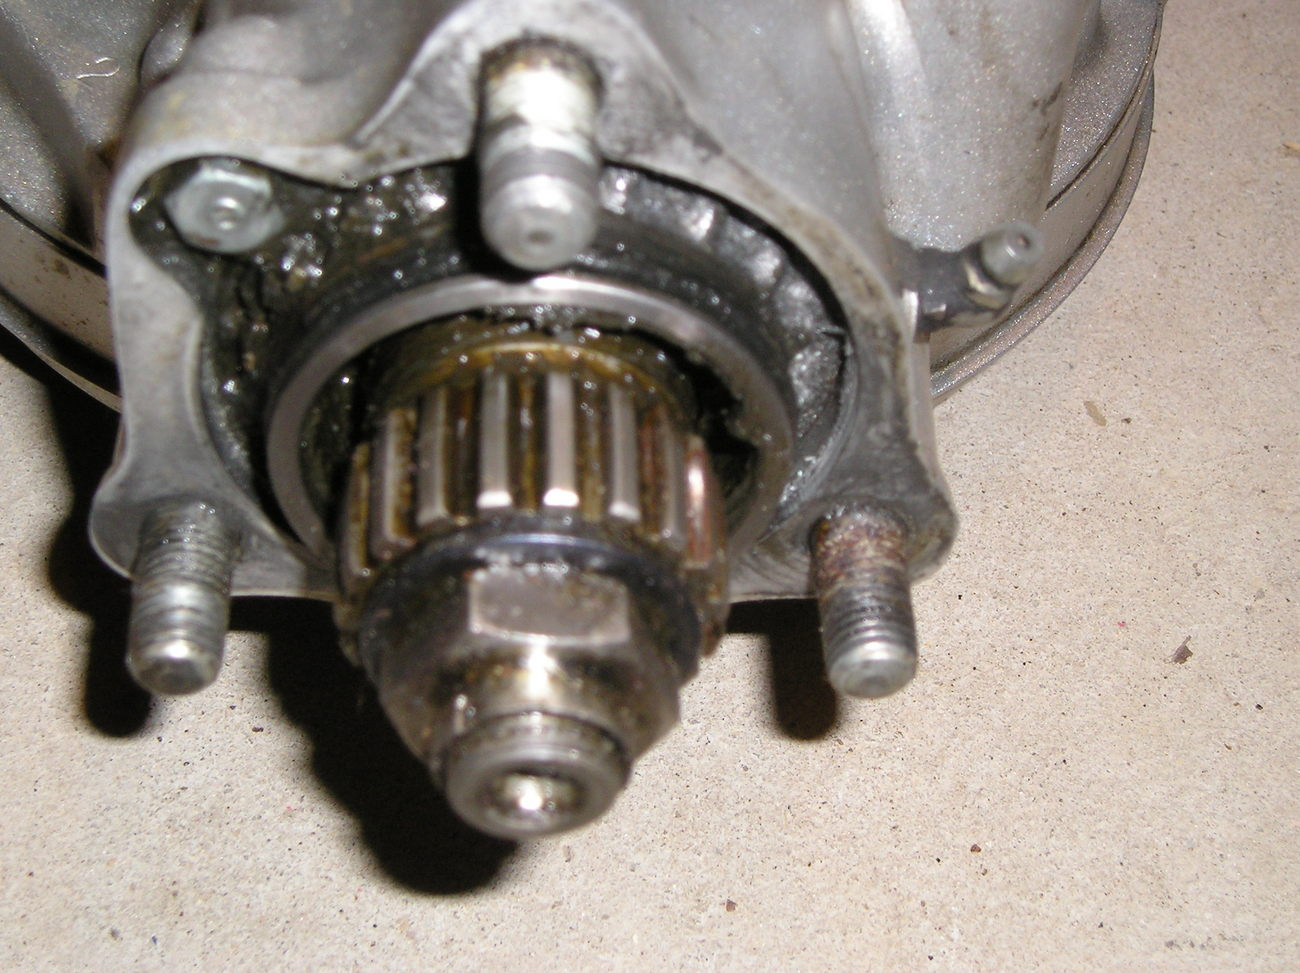 Honda GL1100 80-82, CB900C 80-82 final driven gear assembly